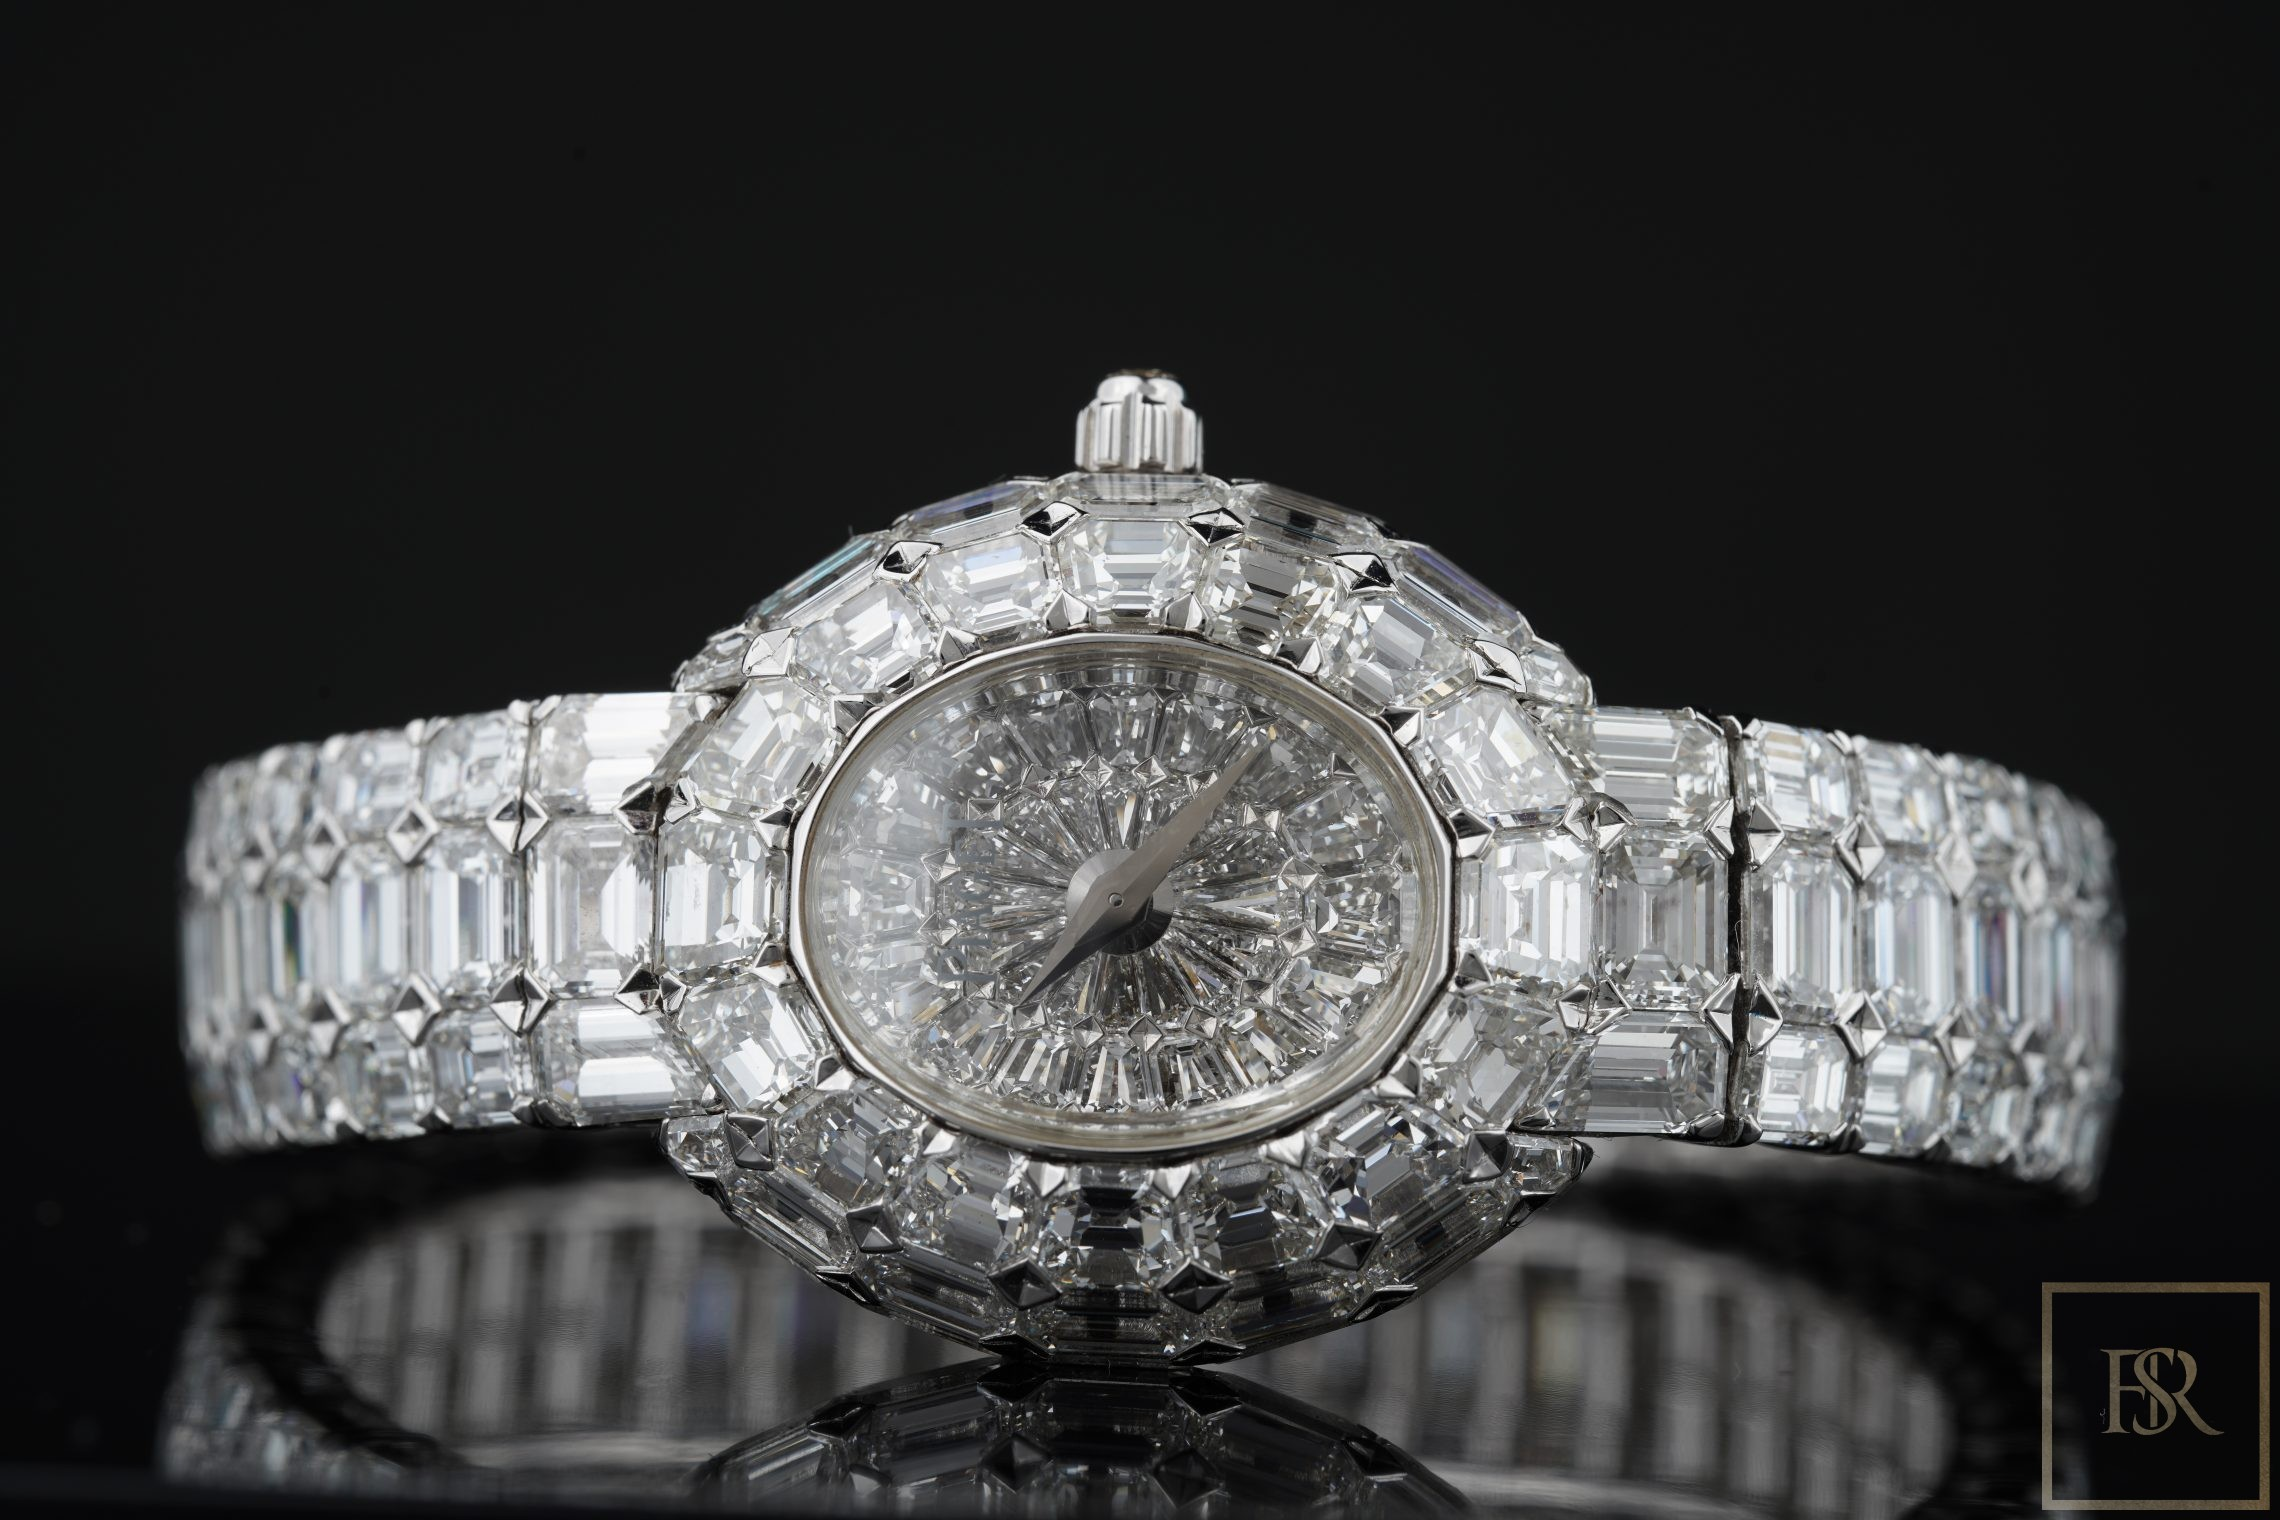 Watch PIAGET Limelight Gala 18k White Gold Diamond Unique Piece 1/1 for sale For Super Rich